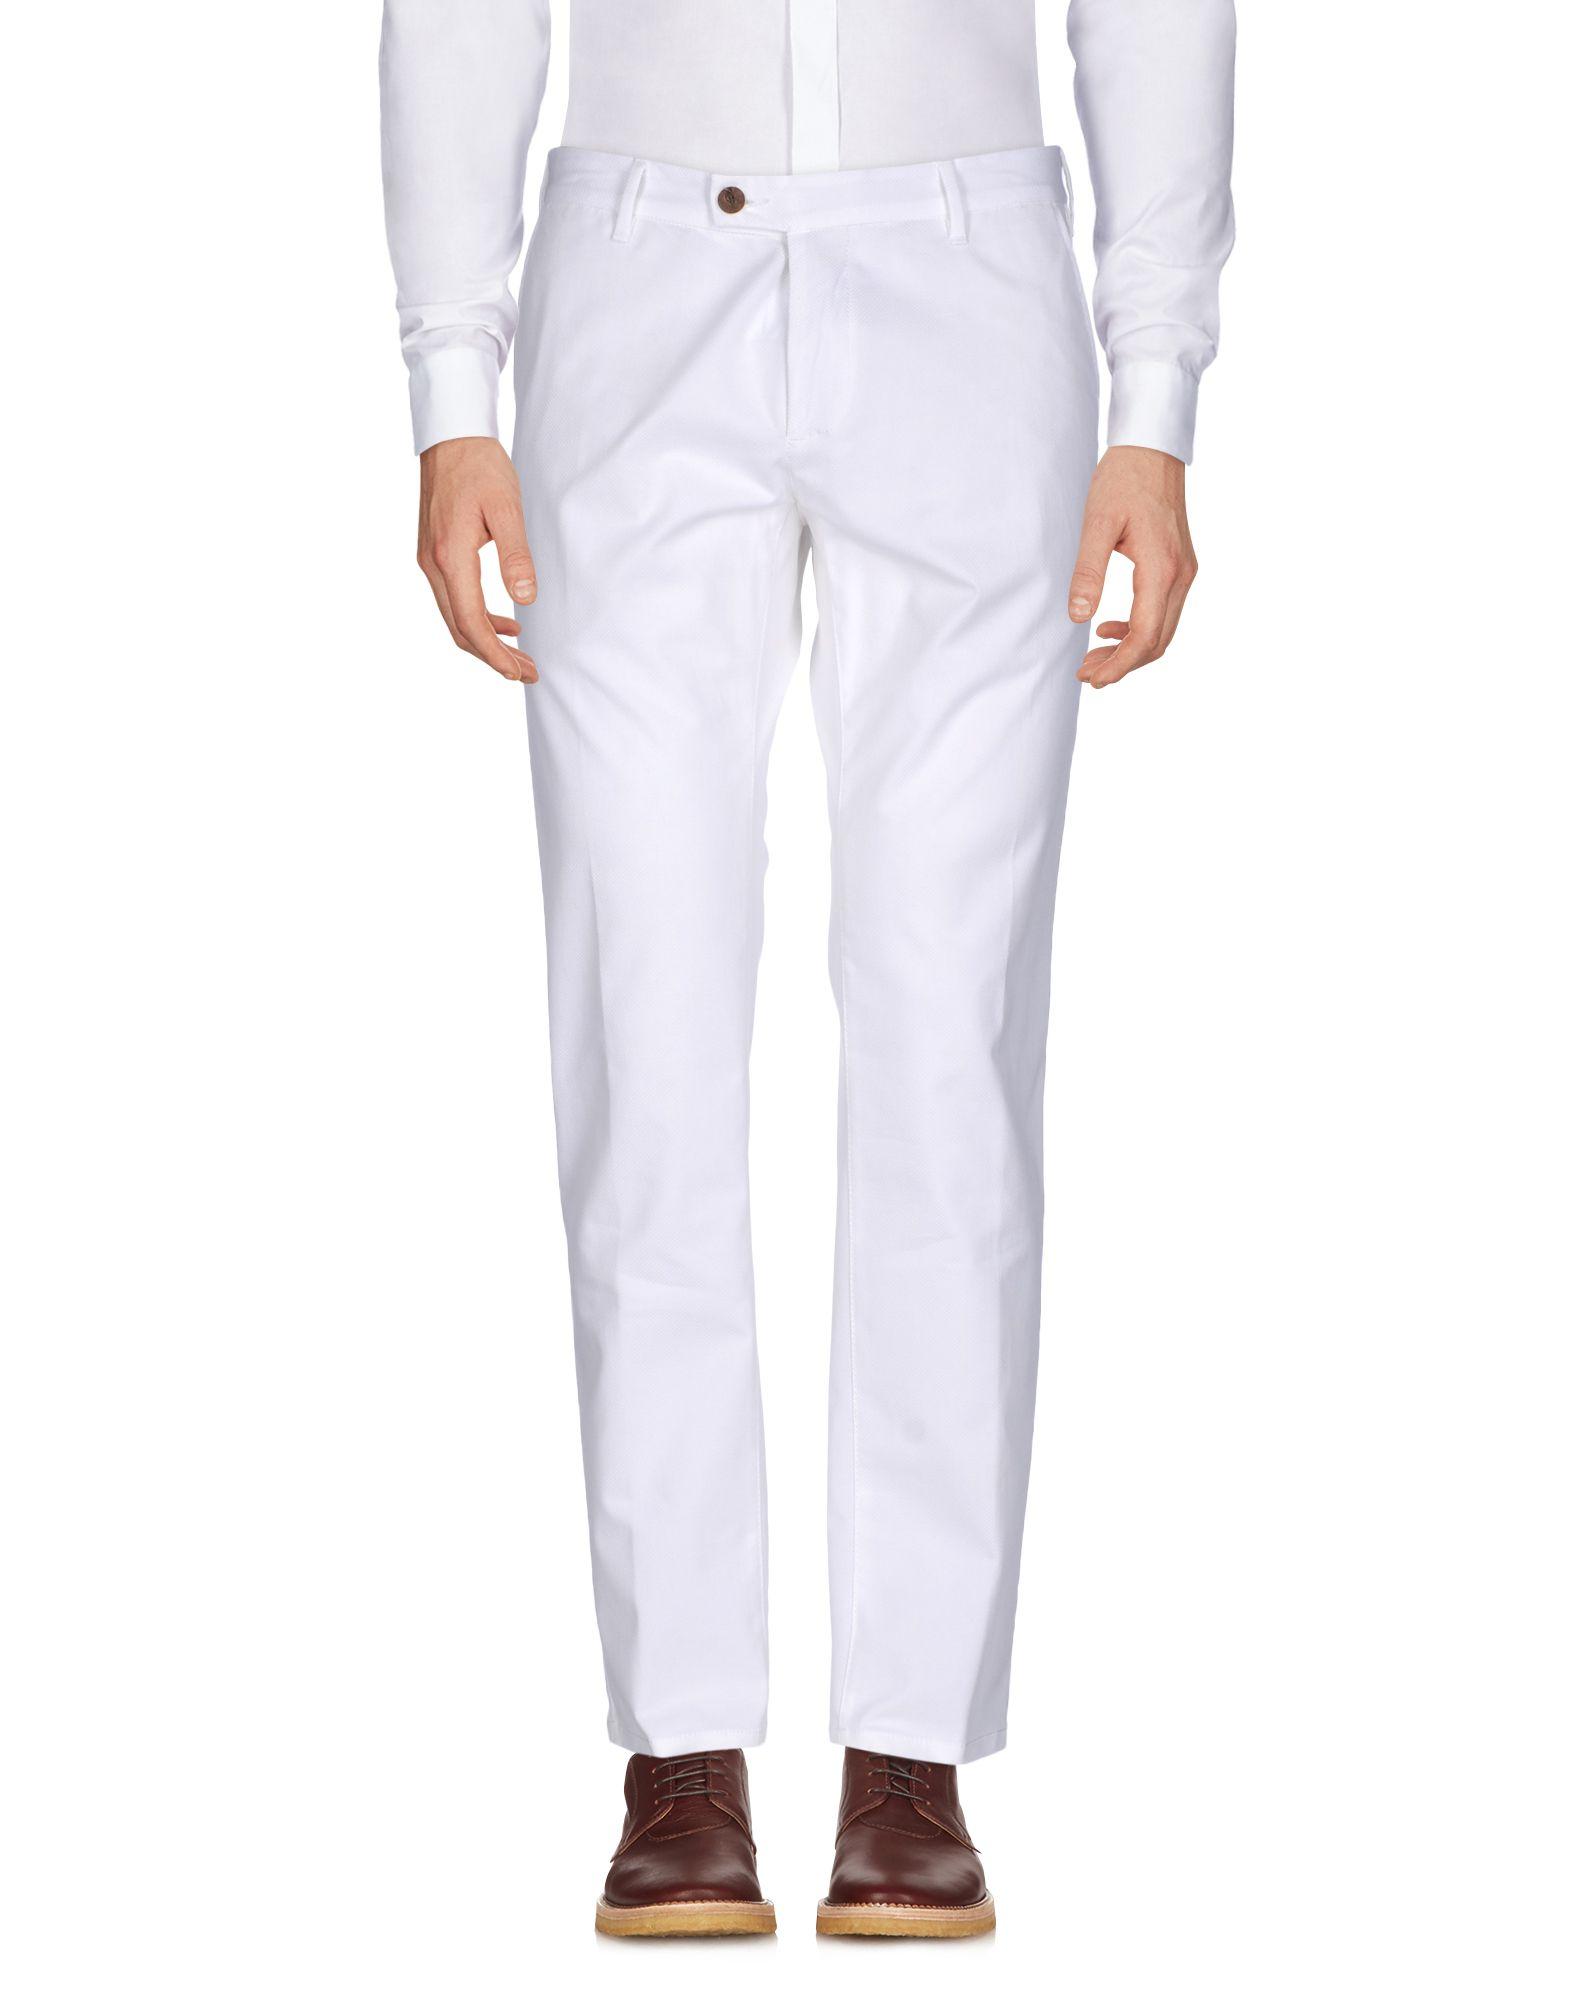 Pantalone Myths Uomo - Acquista online su